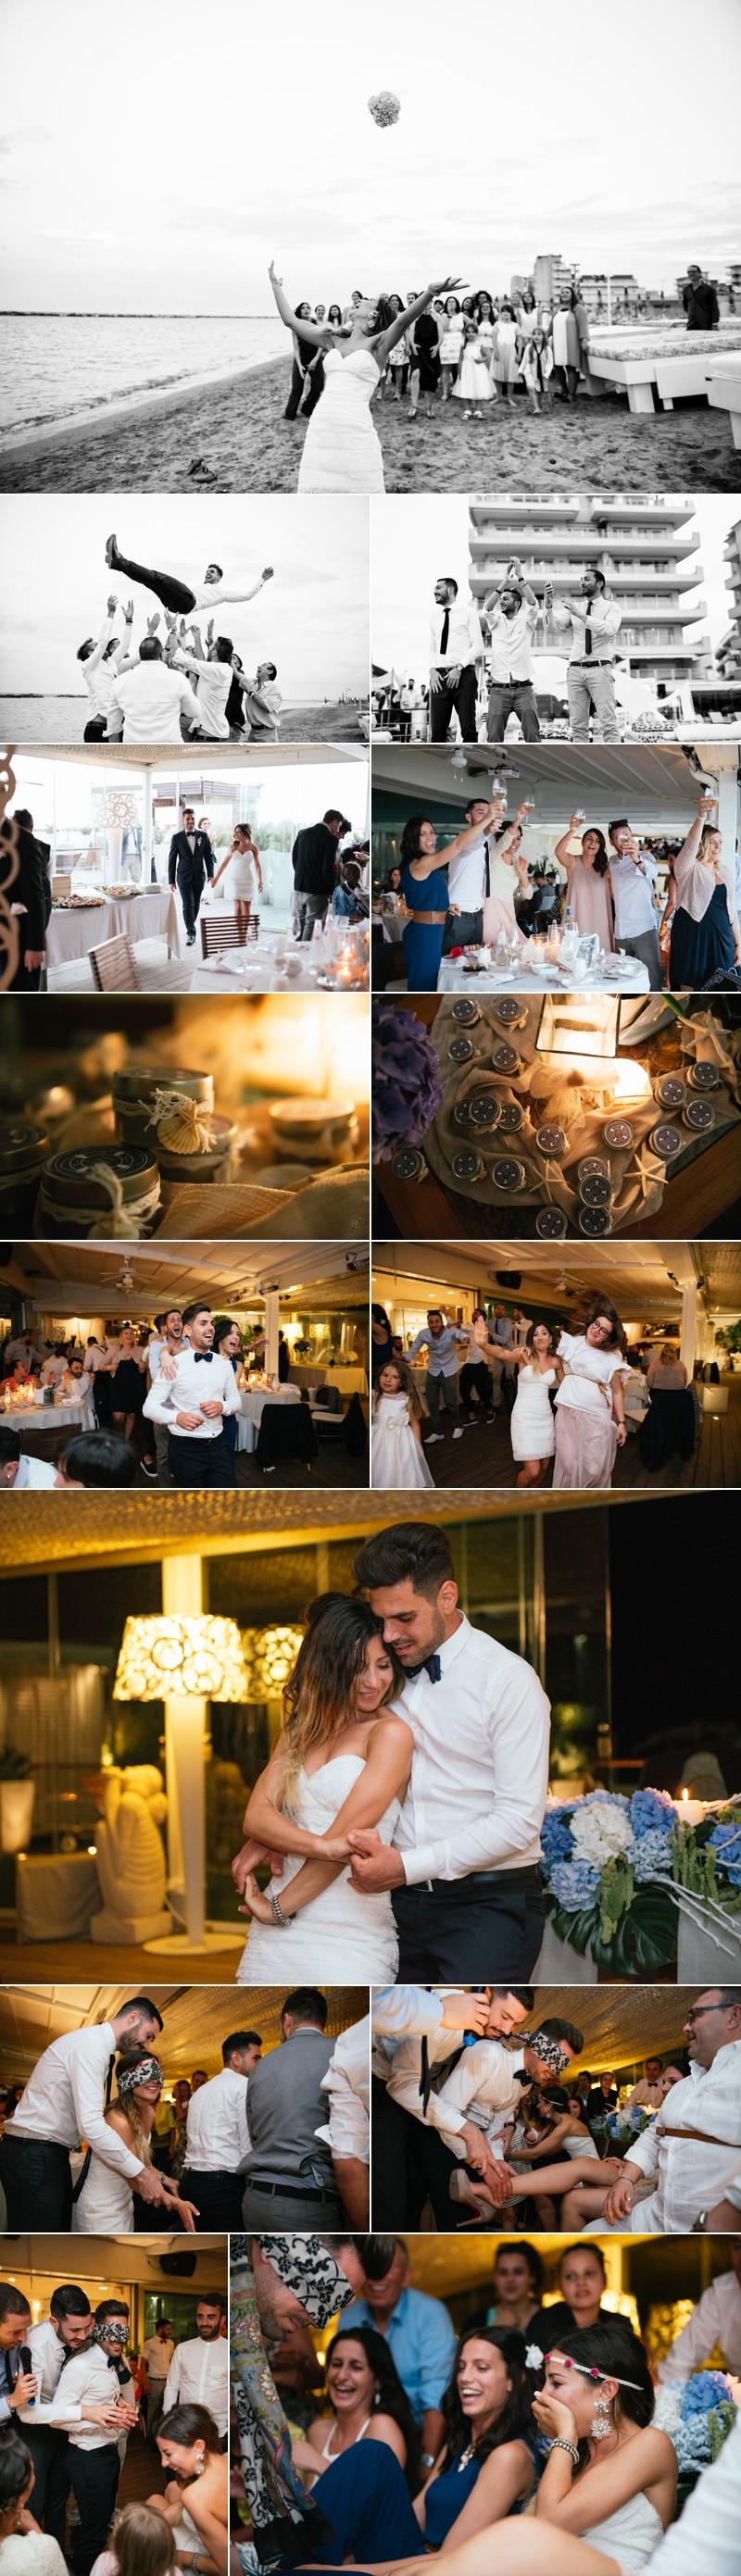 Matrimonio Cesena Vistamare Suite Hotel Savio 8